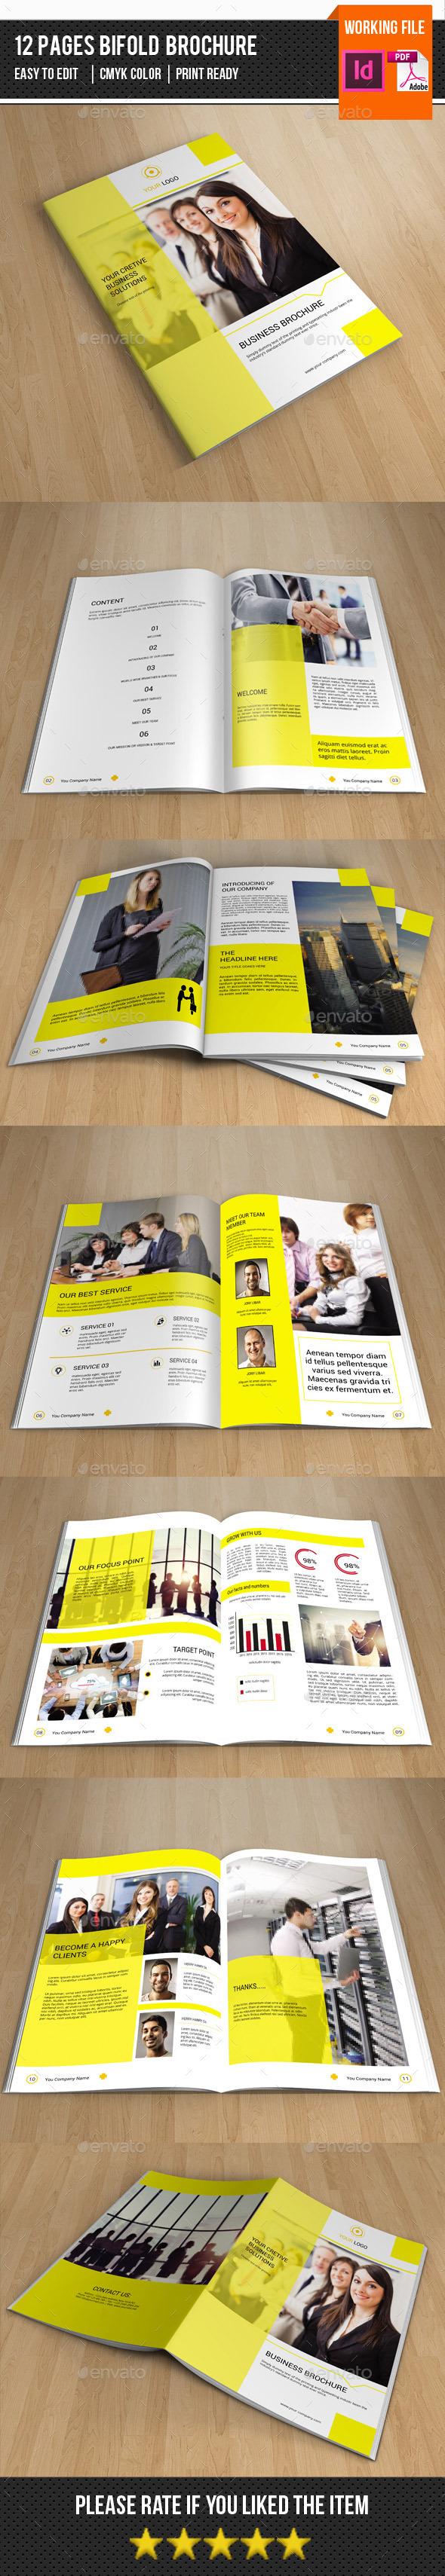 Corporate Brochure Template-v277 - Corporate Brochures